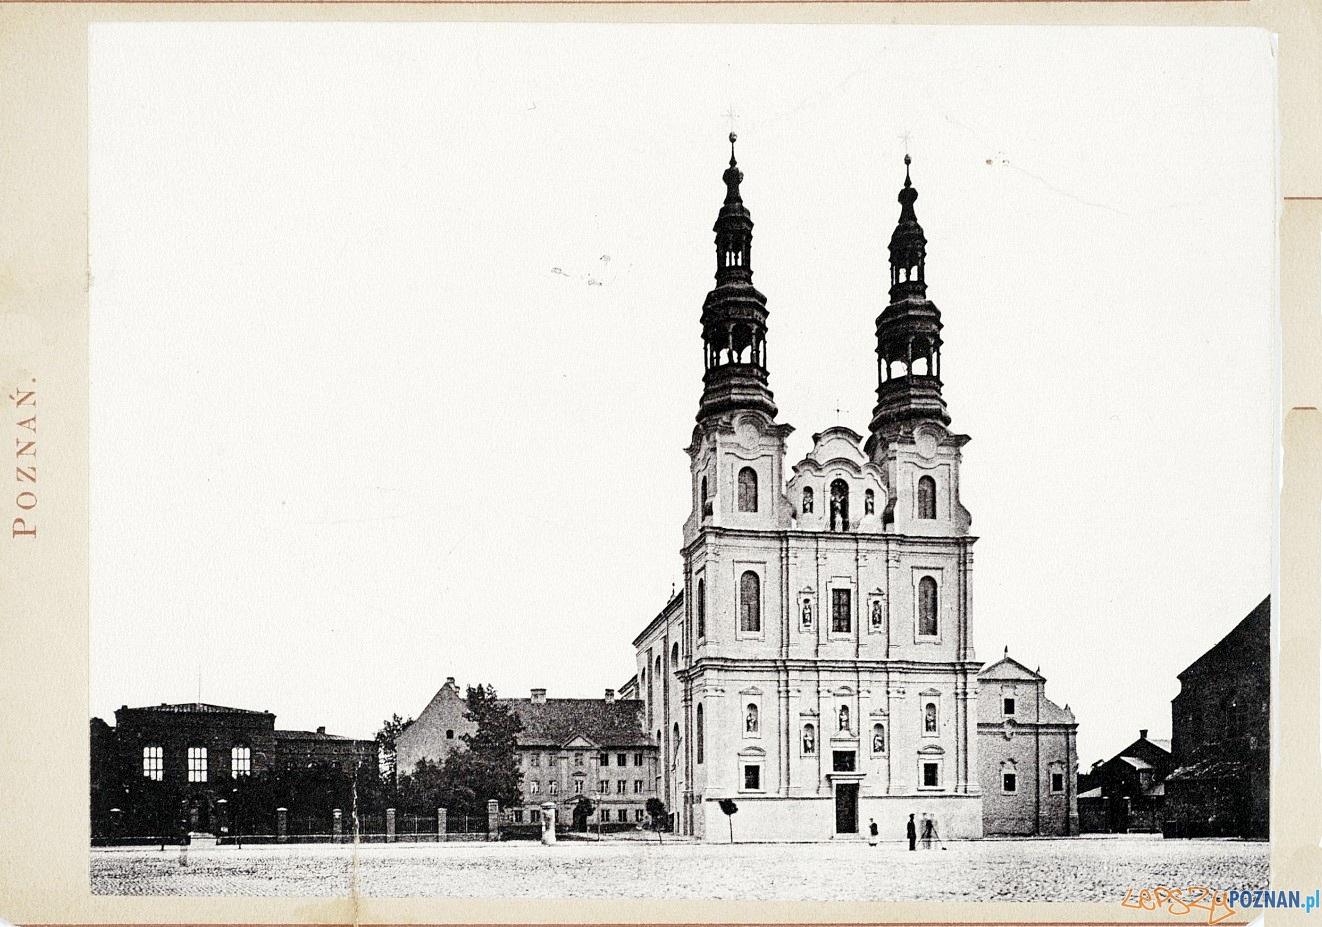 Kościół Franciszkanów przy Placu Bernardyńskim, rok 1884 Foto: fotopolska.eu